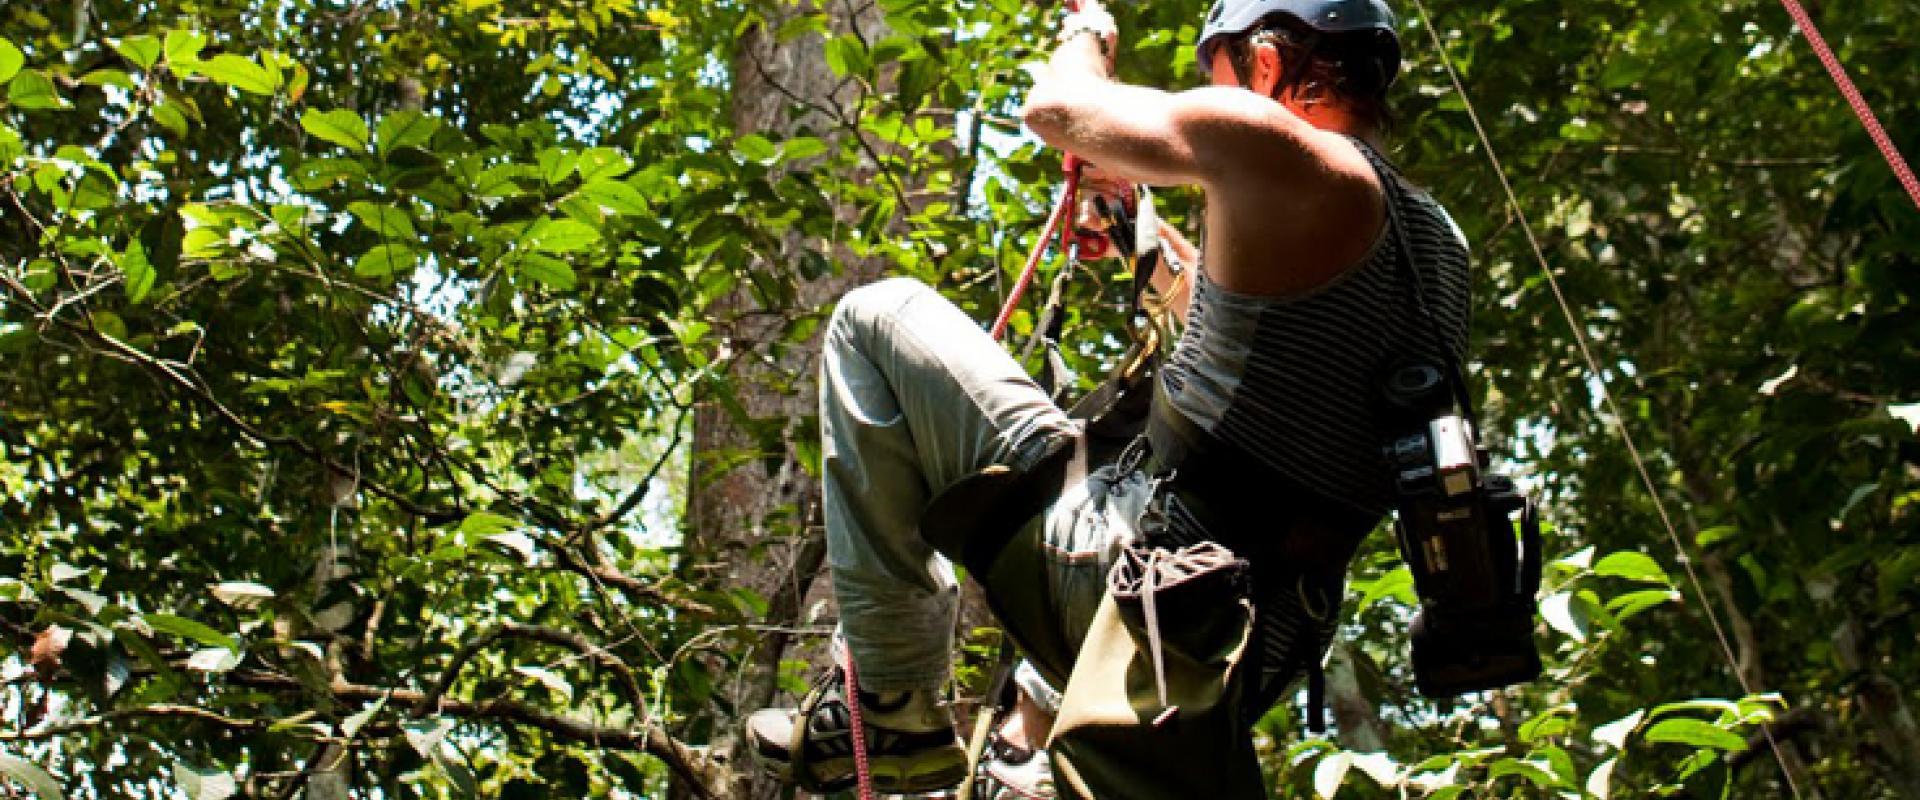 tree climbing in Tanagro valley